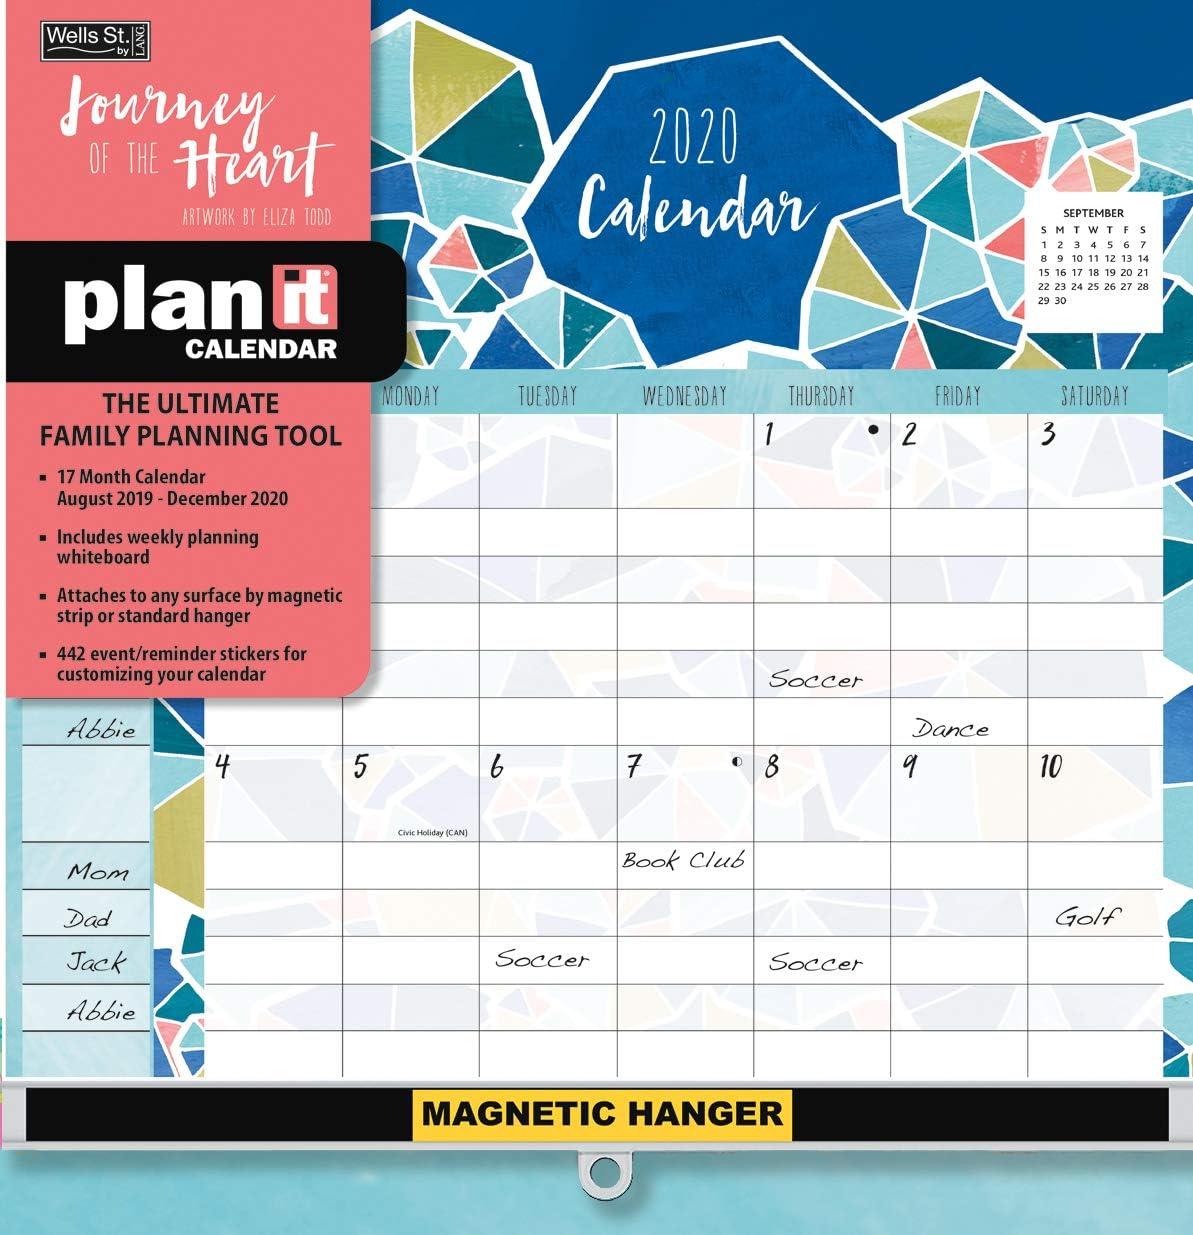 Wells Street by LANG WSBL Journey of The Heart 2020 Plan-It Plus (20997009181) Academic Wall Calendar (20997009181)